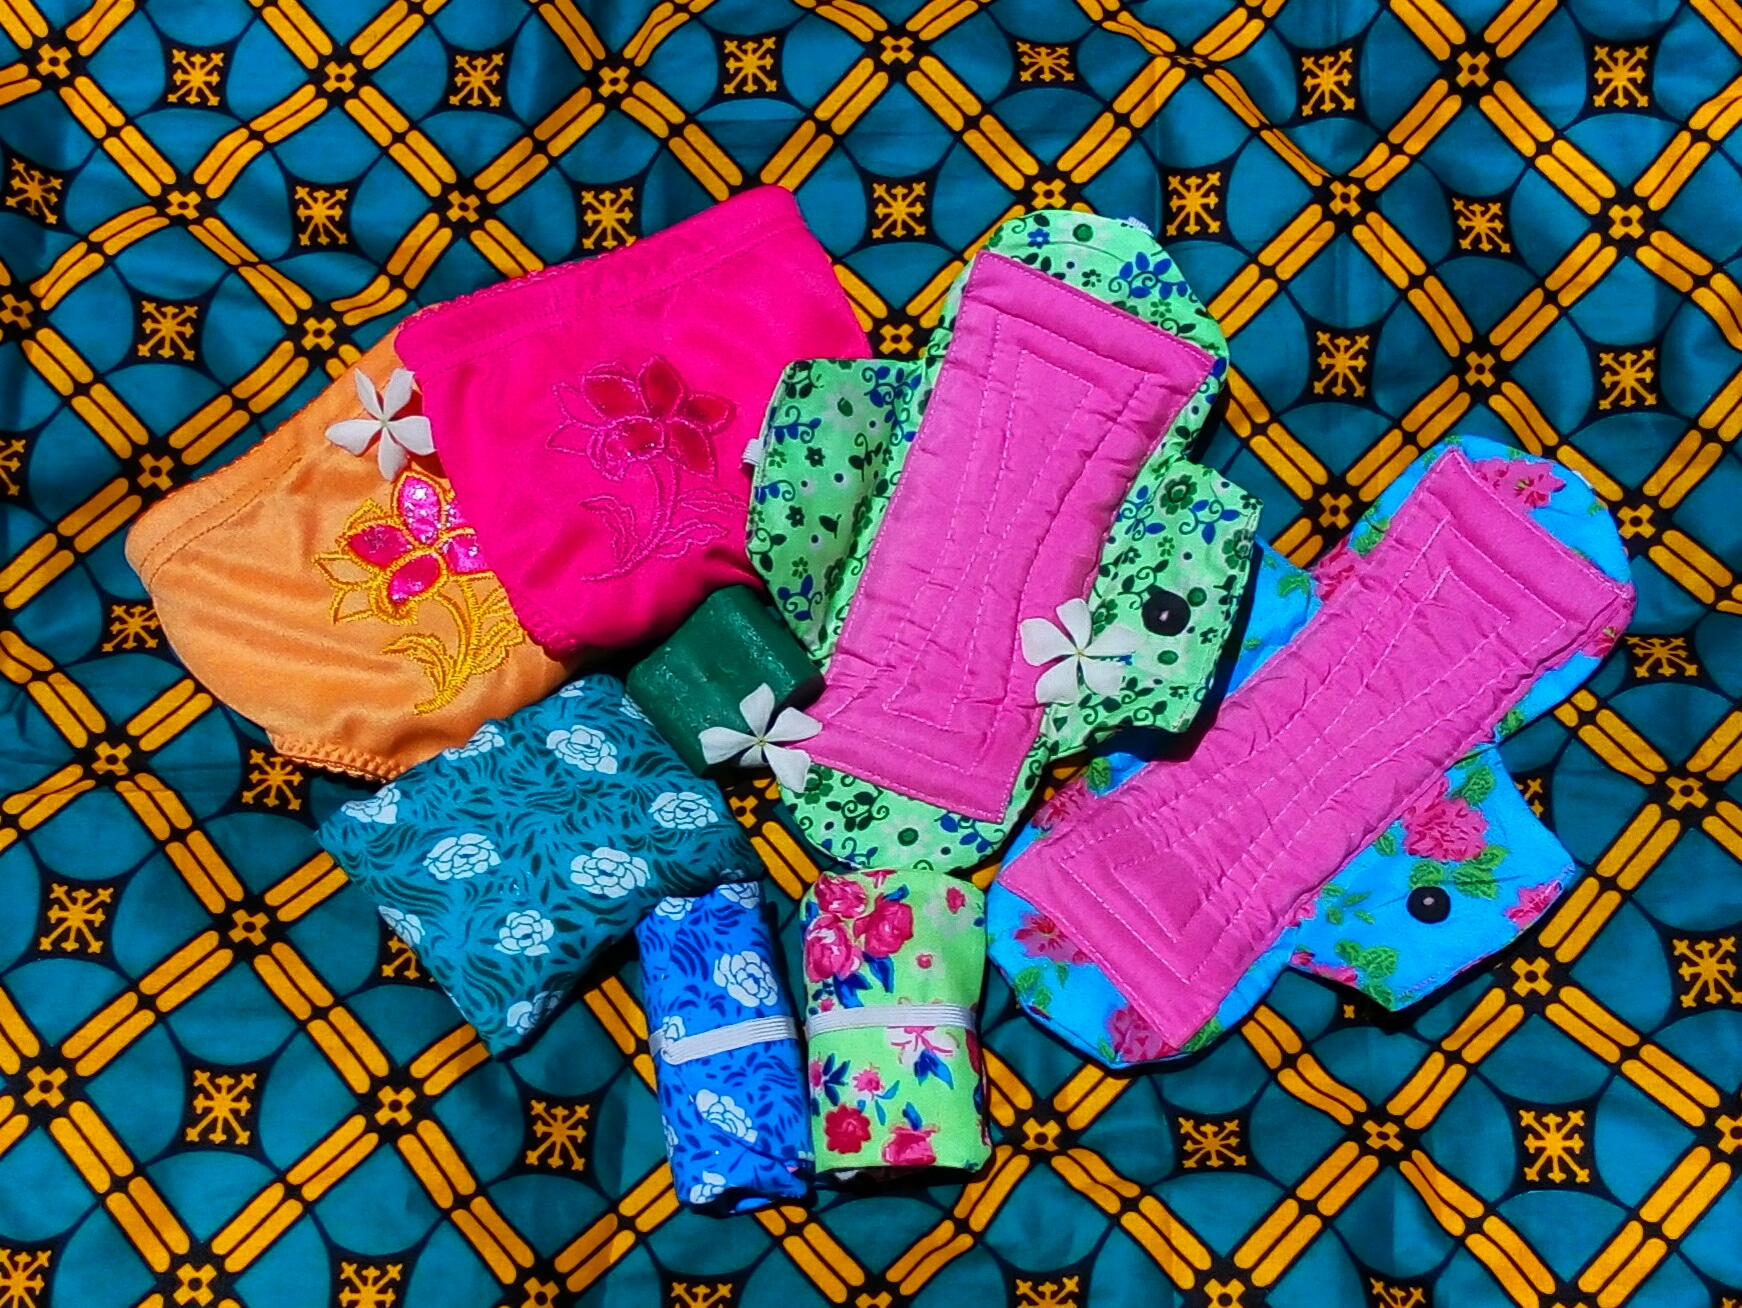 schoolgirl kit pack reusable sanitary pads .jpg